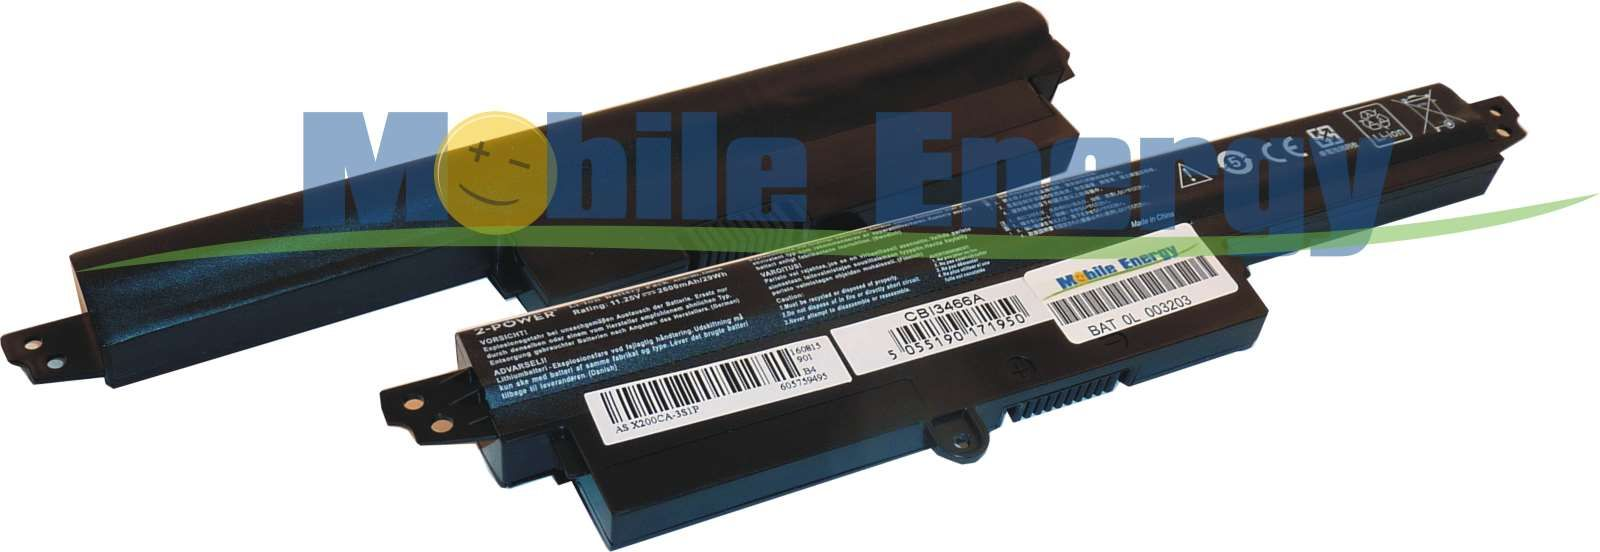 Mobile-Energy Baterie Asus X200CA / X200LA / X200MA / F200CA /F2